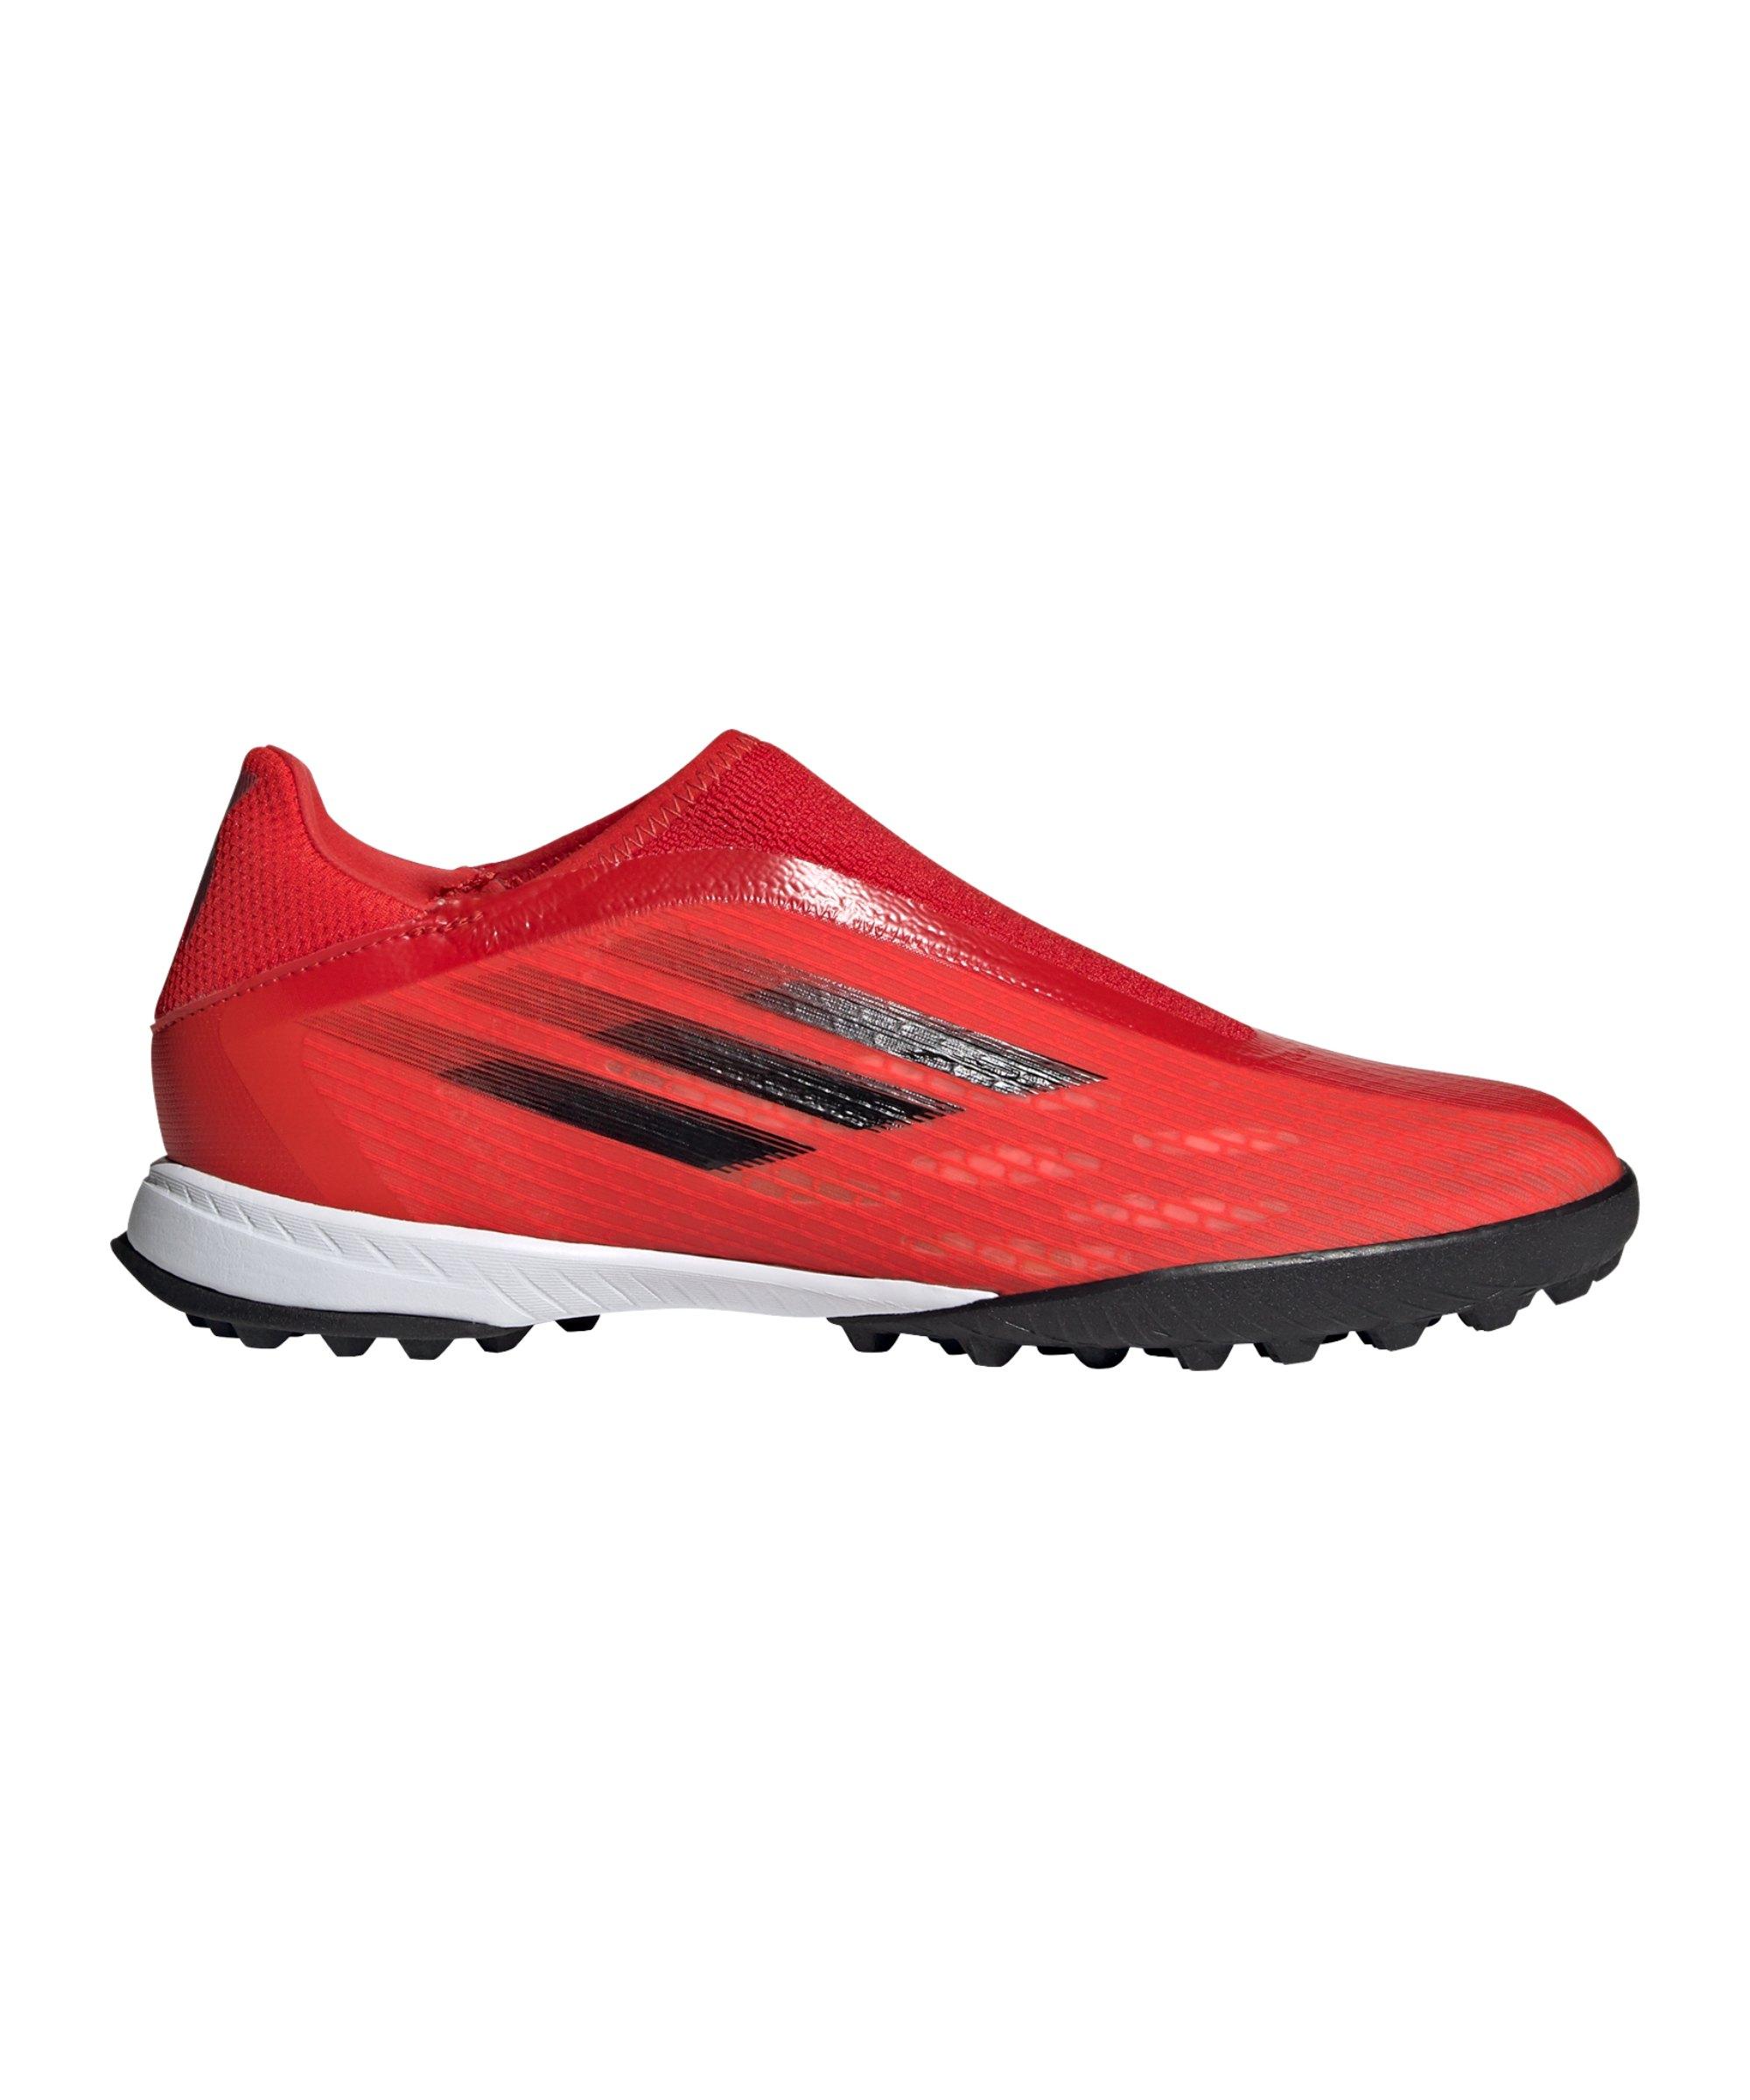 adidas X SPEEDFLOW.3 LL TF Meteorite Rot Schwarz - rot